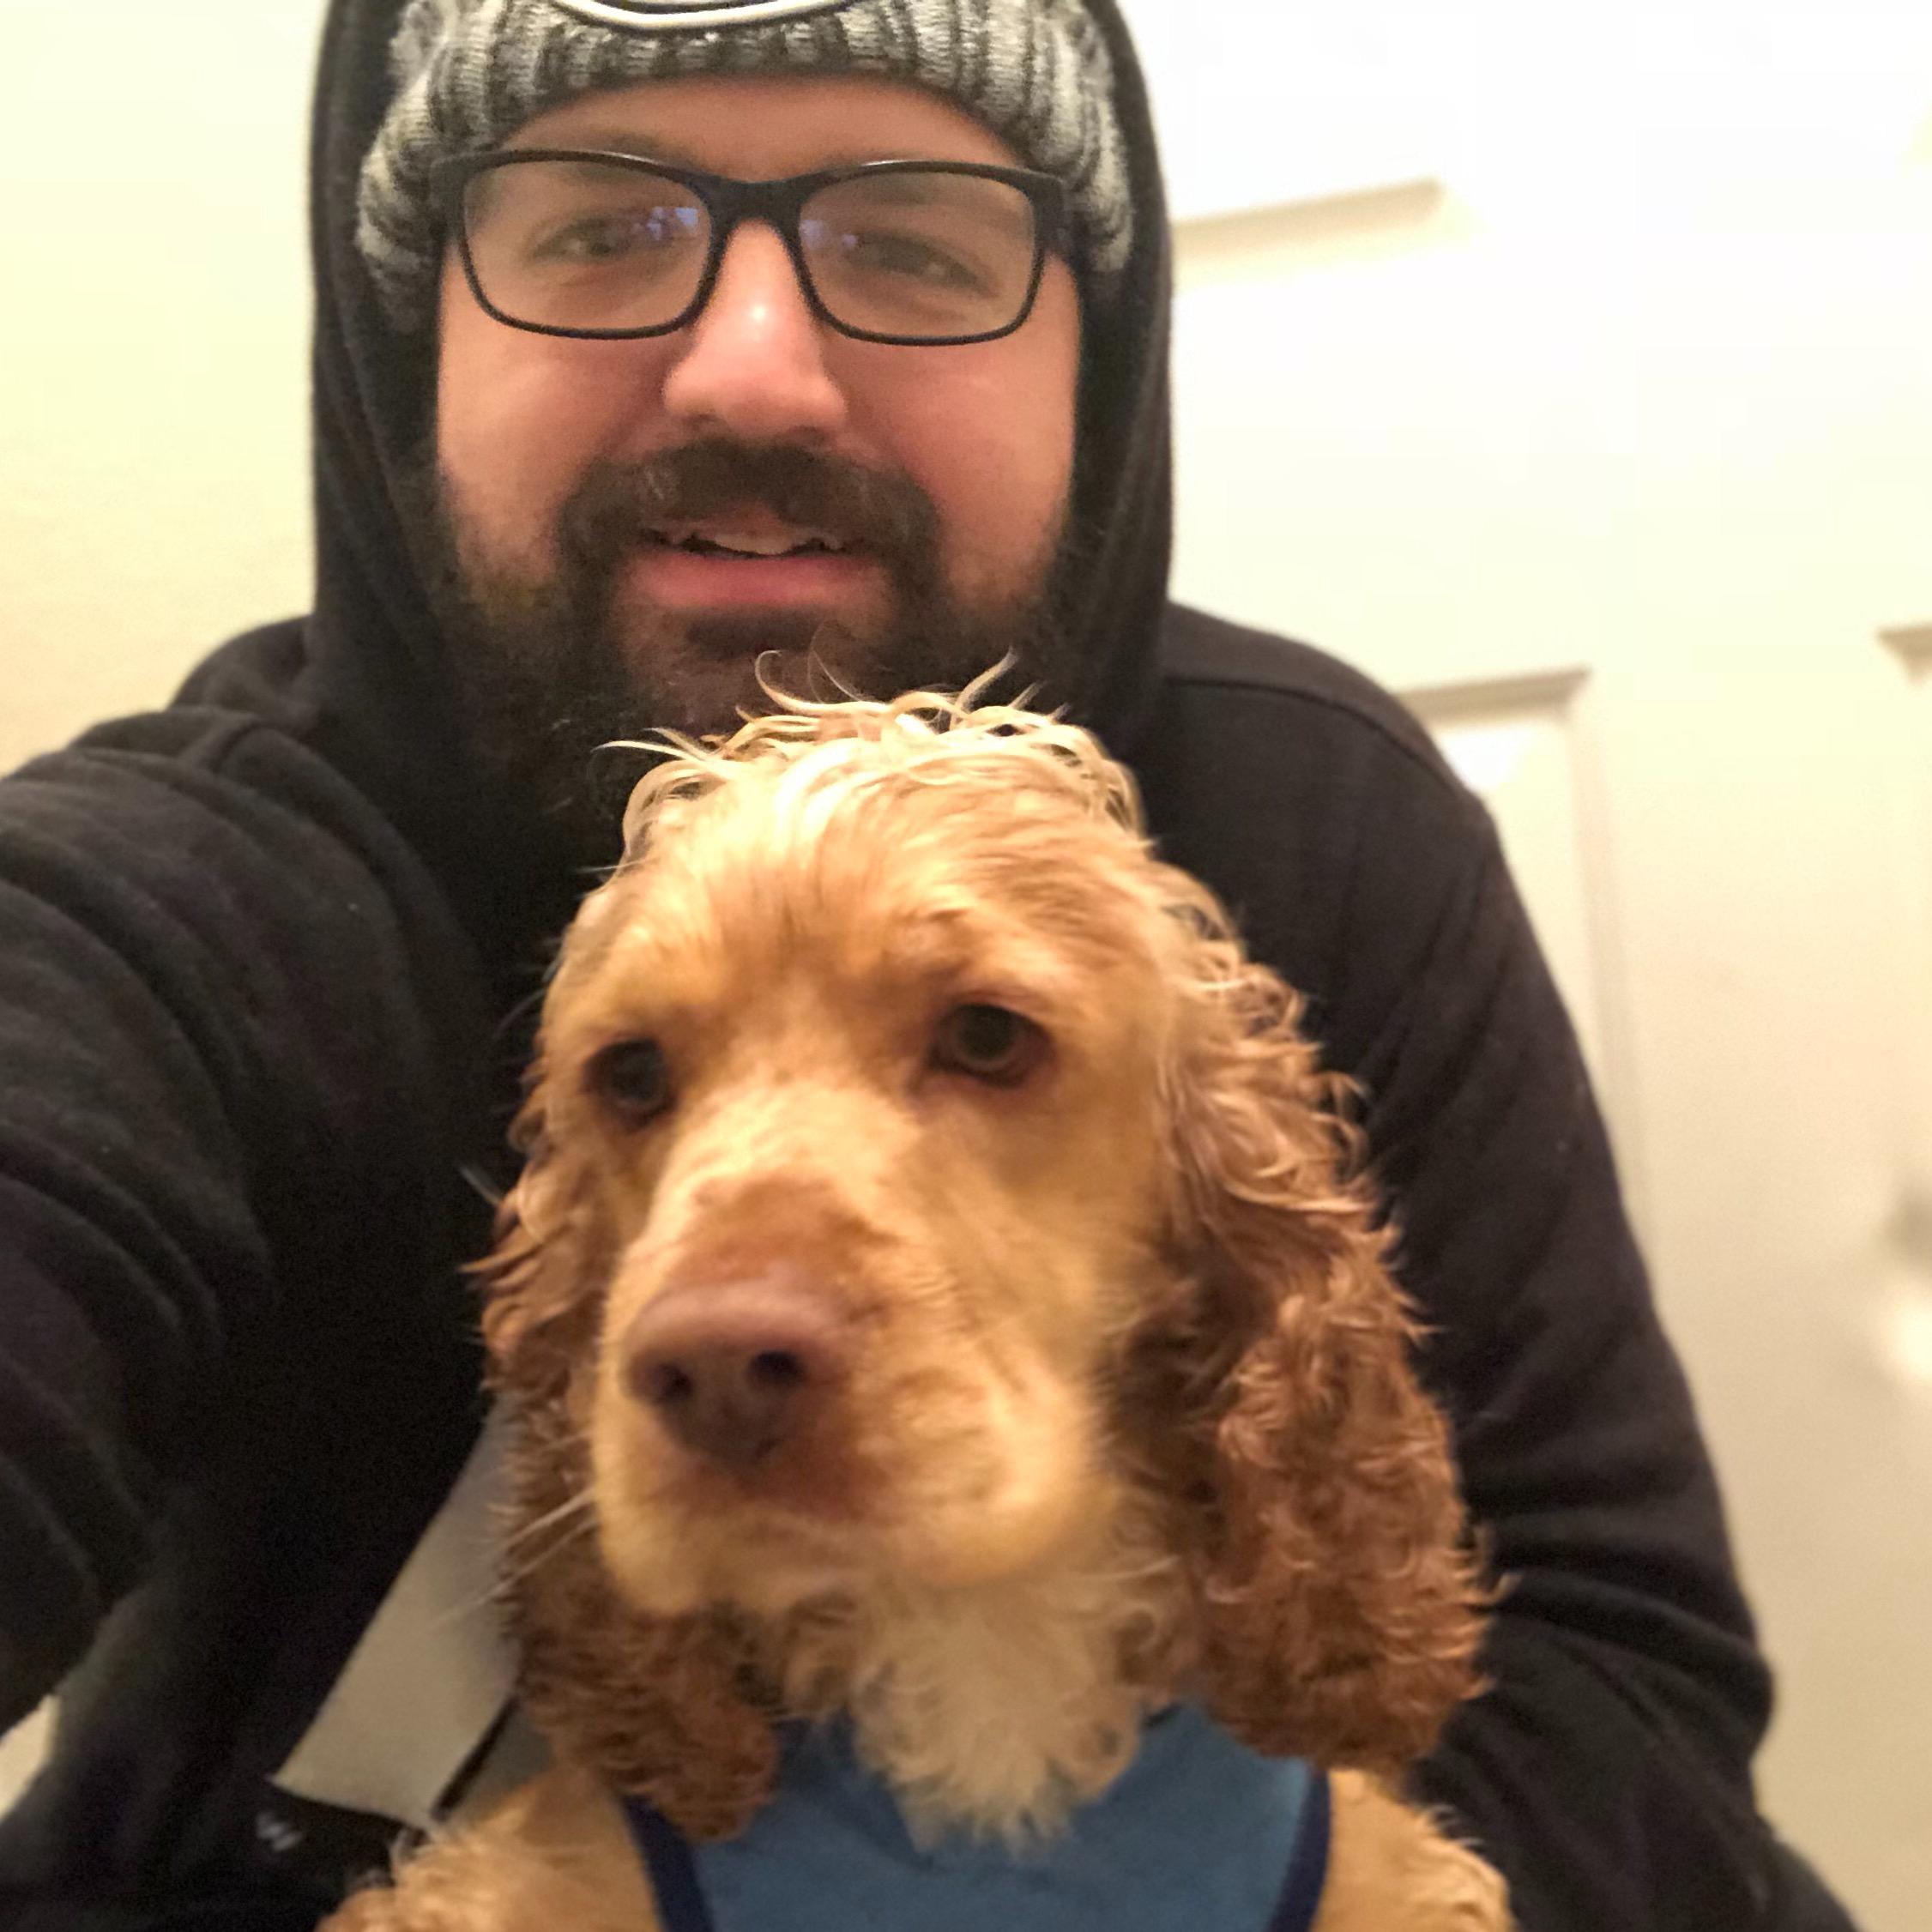 Brad's dog boarding